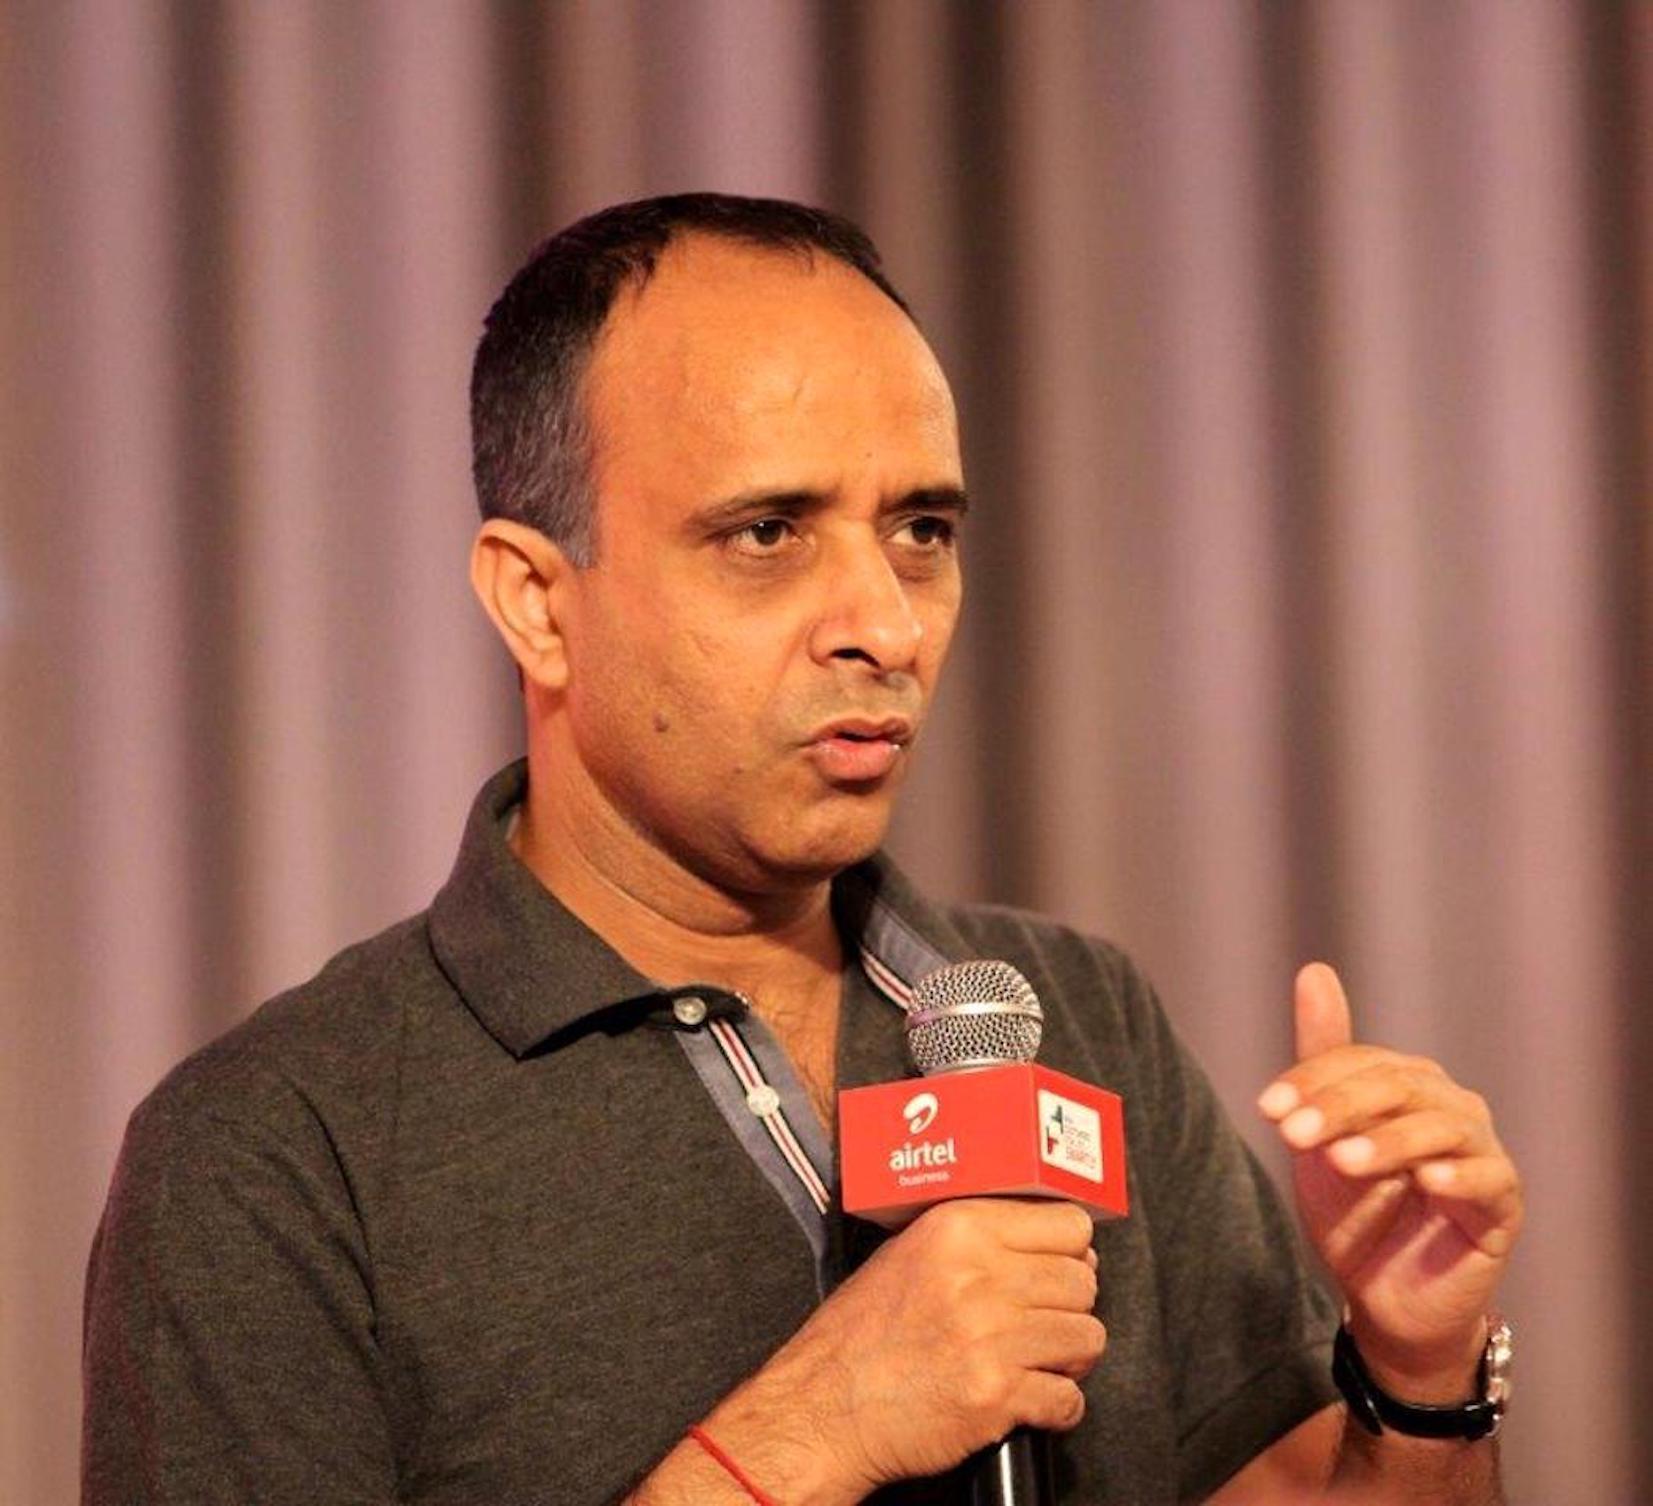 Airtel Enters $ 1 Billion Indian Cloud Communications Market with Airtel IQ